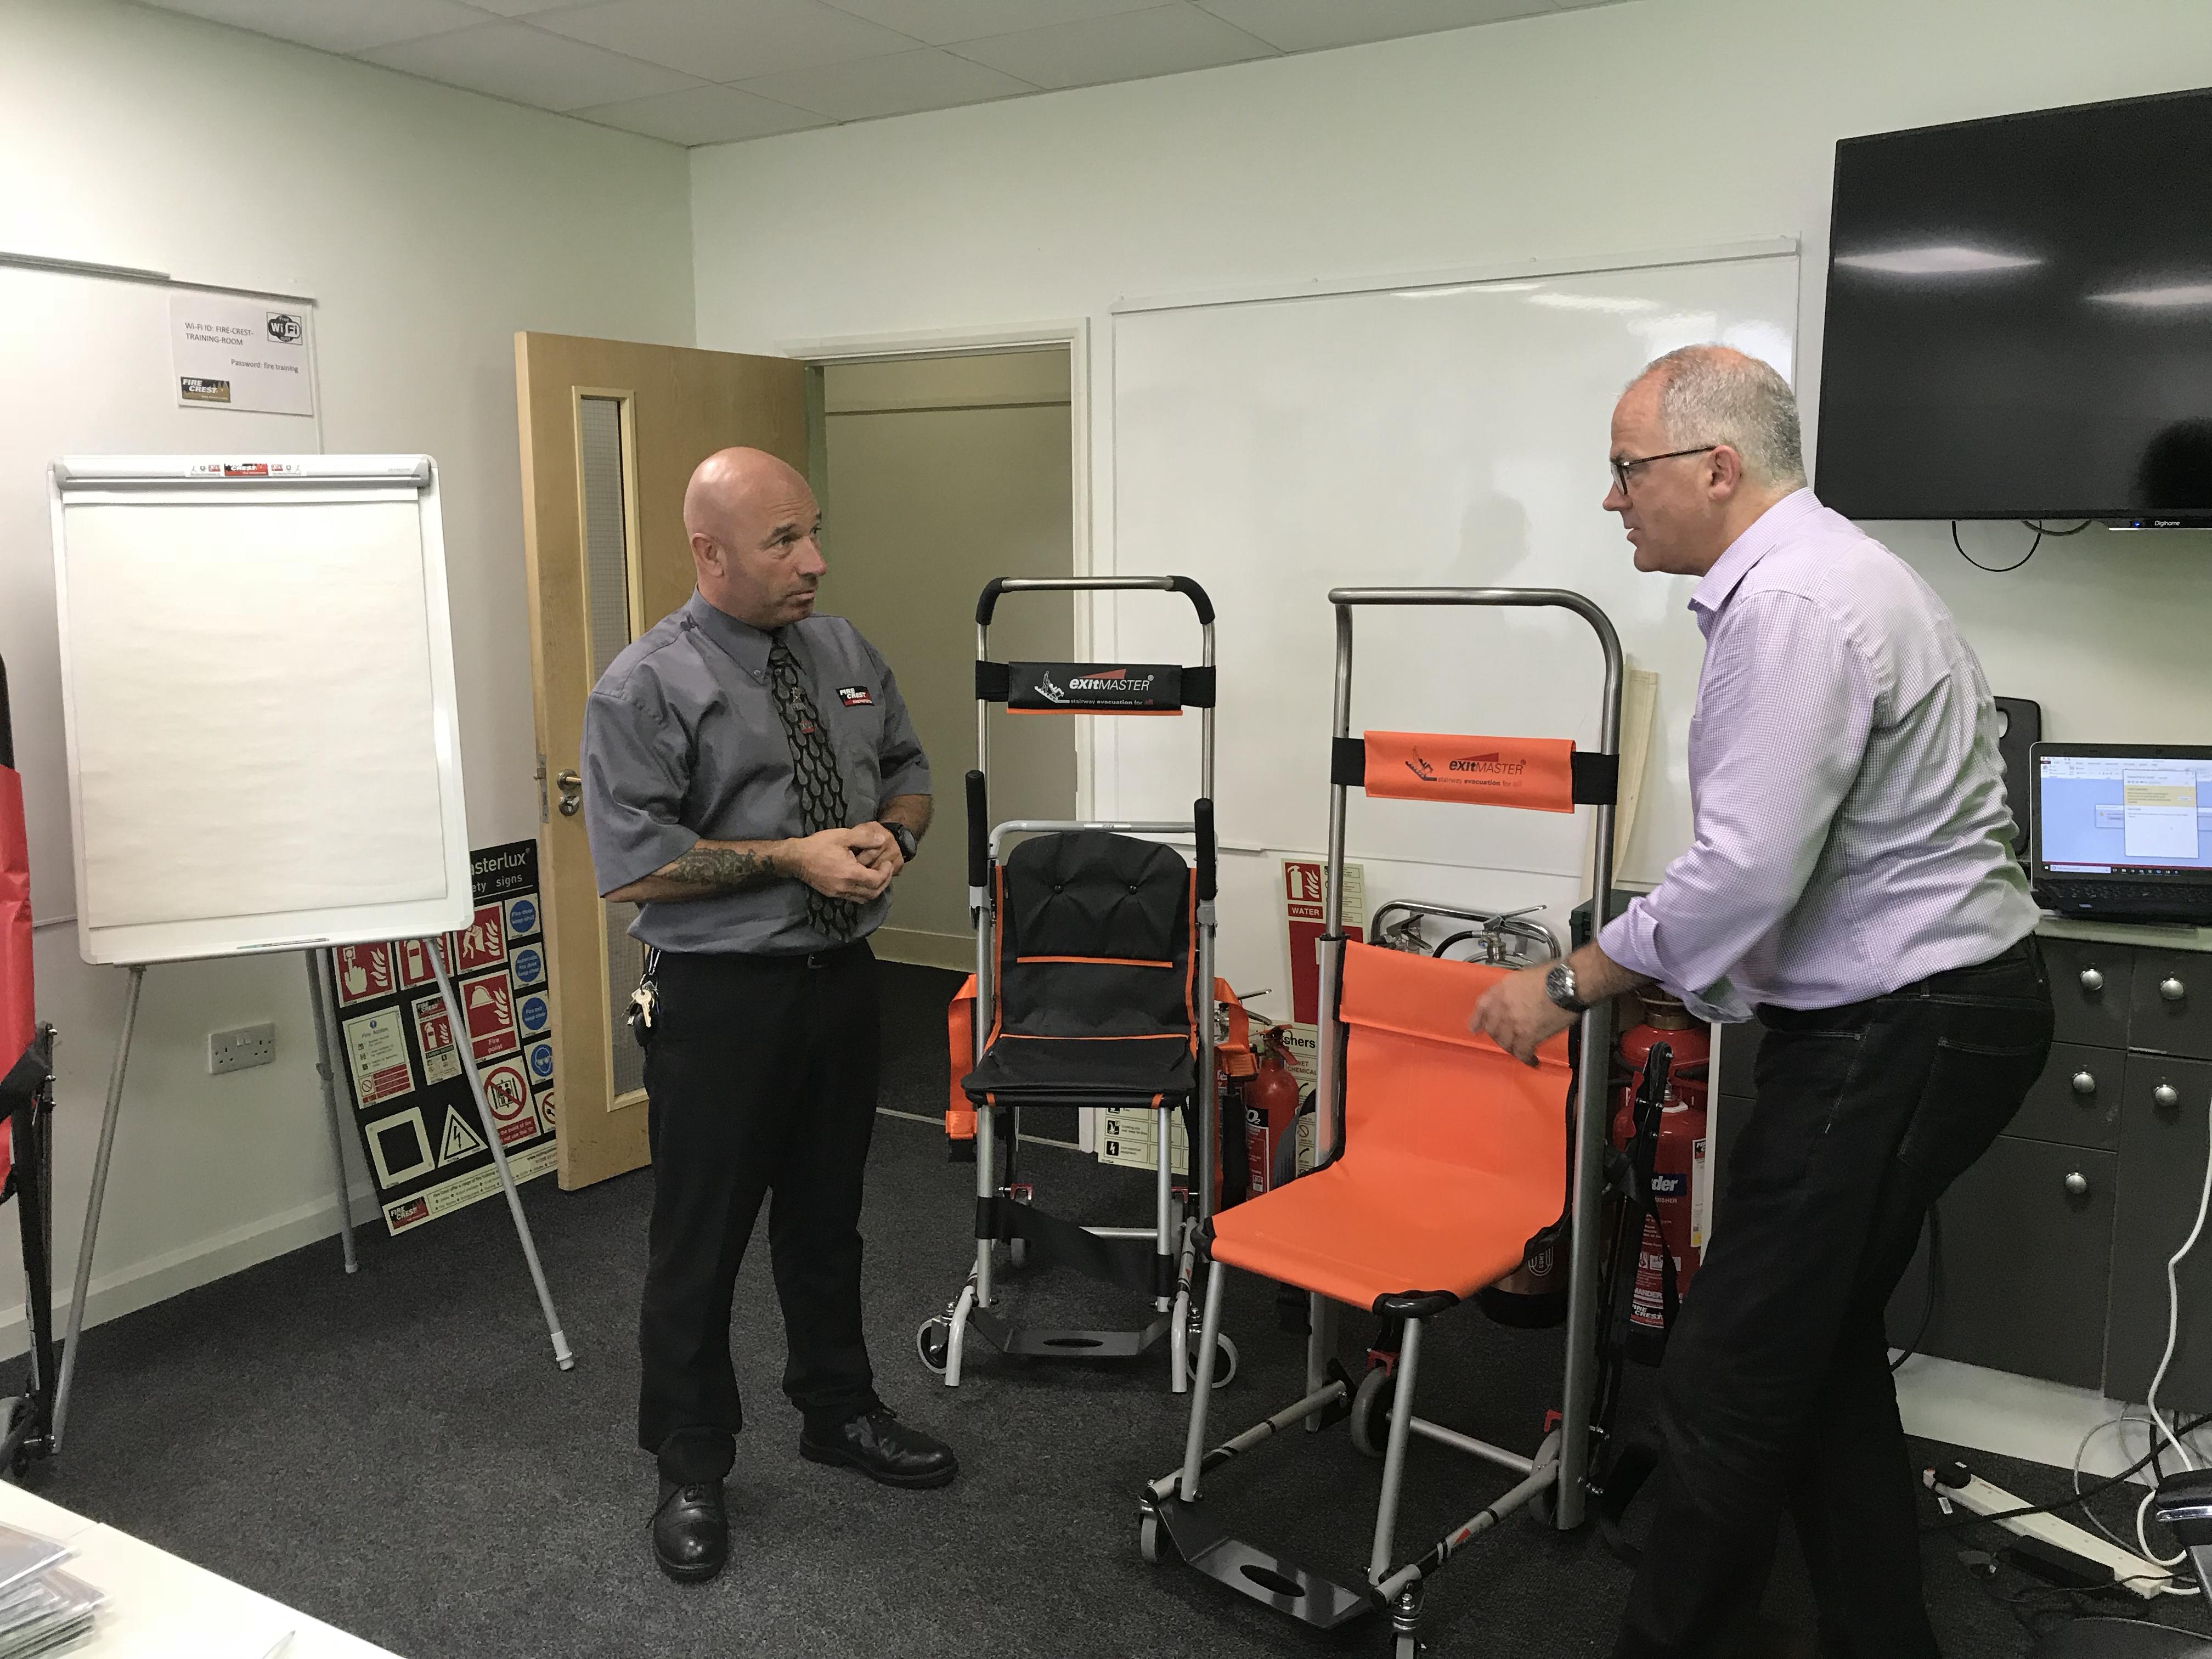 Evacuation chair servicing